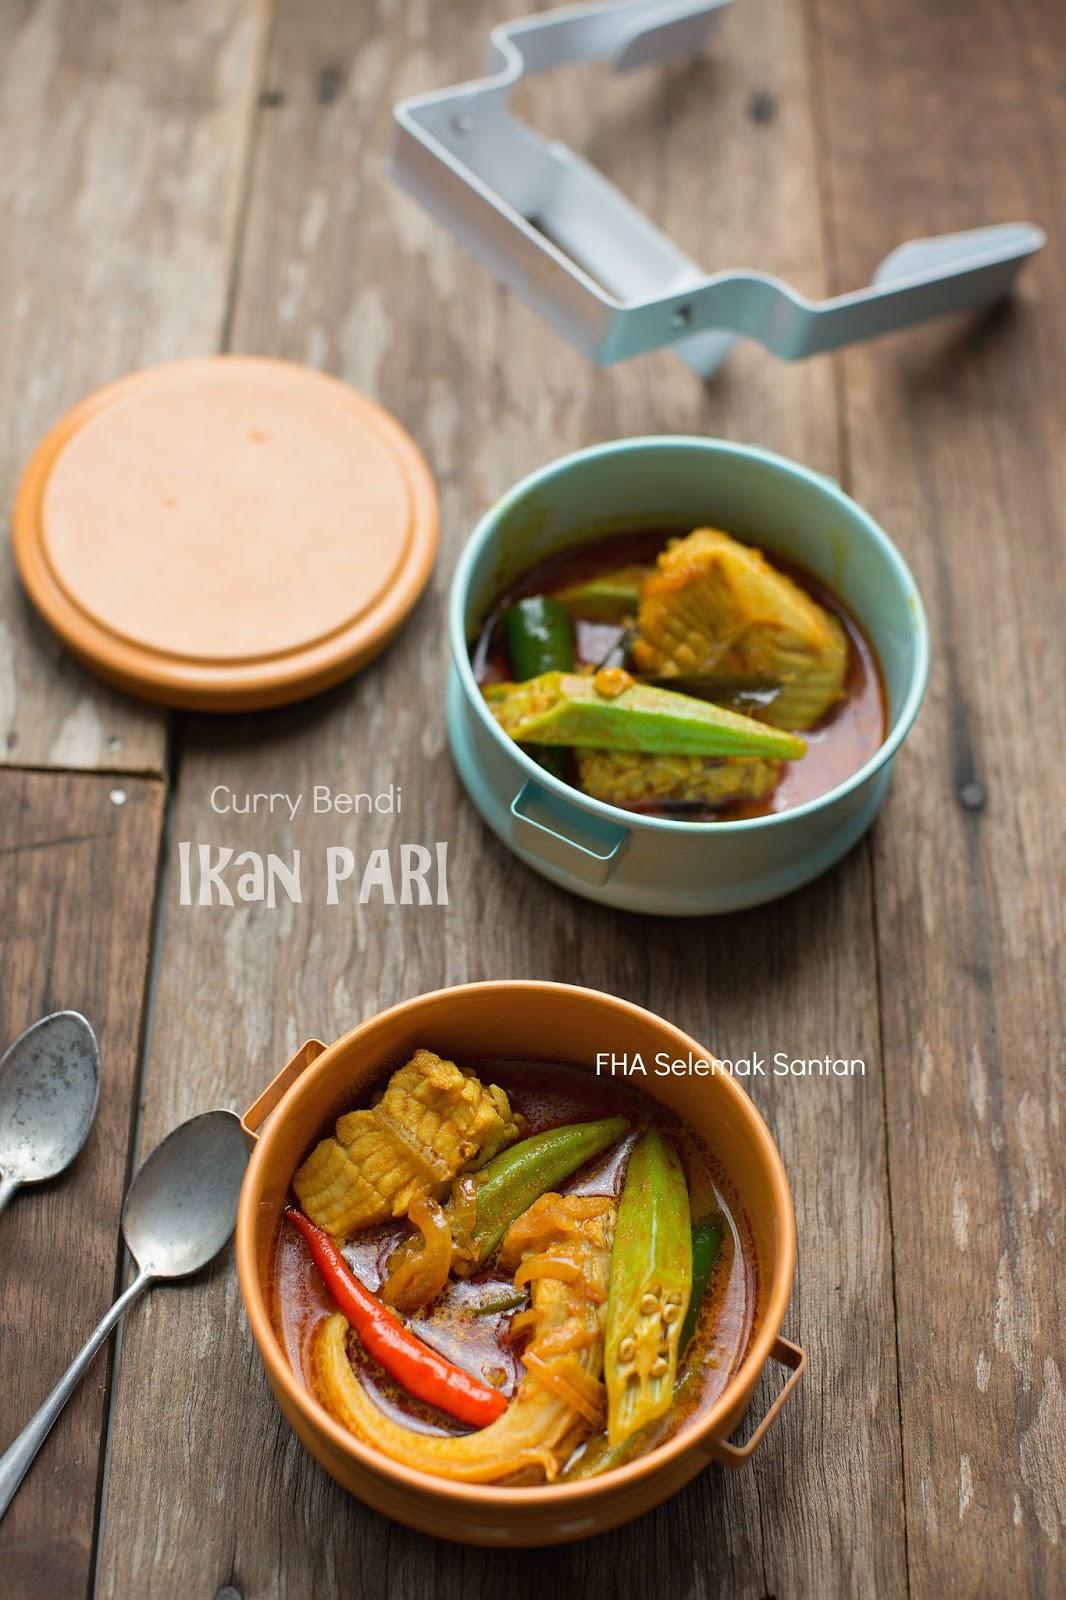 Resepi Ikan Pari Masak Kari Simple ~ Resep Masakan Khas